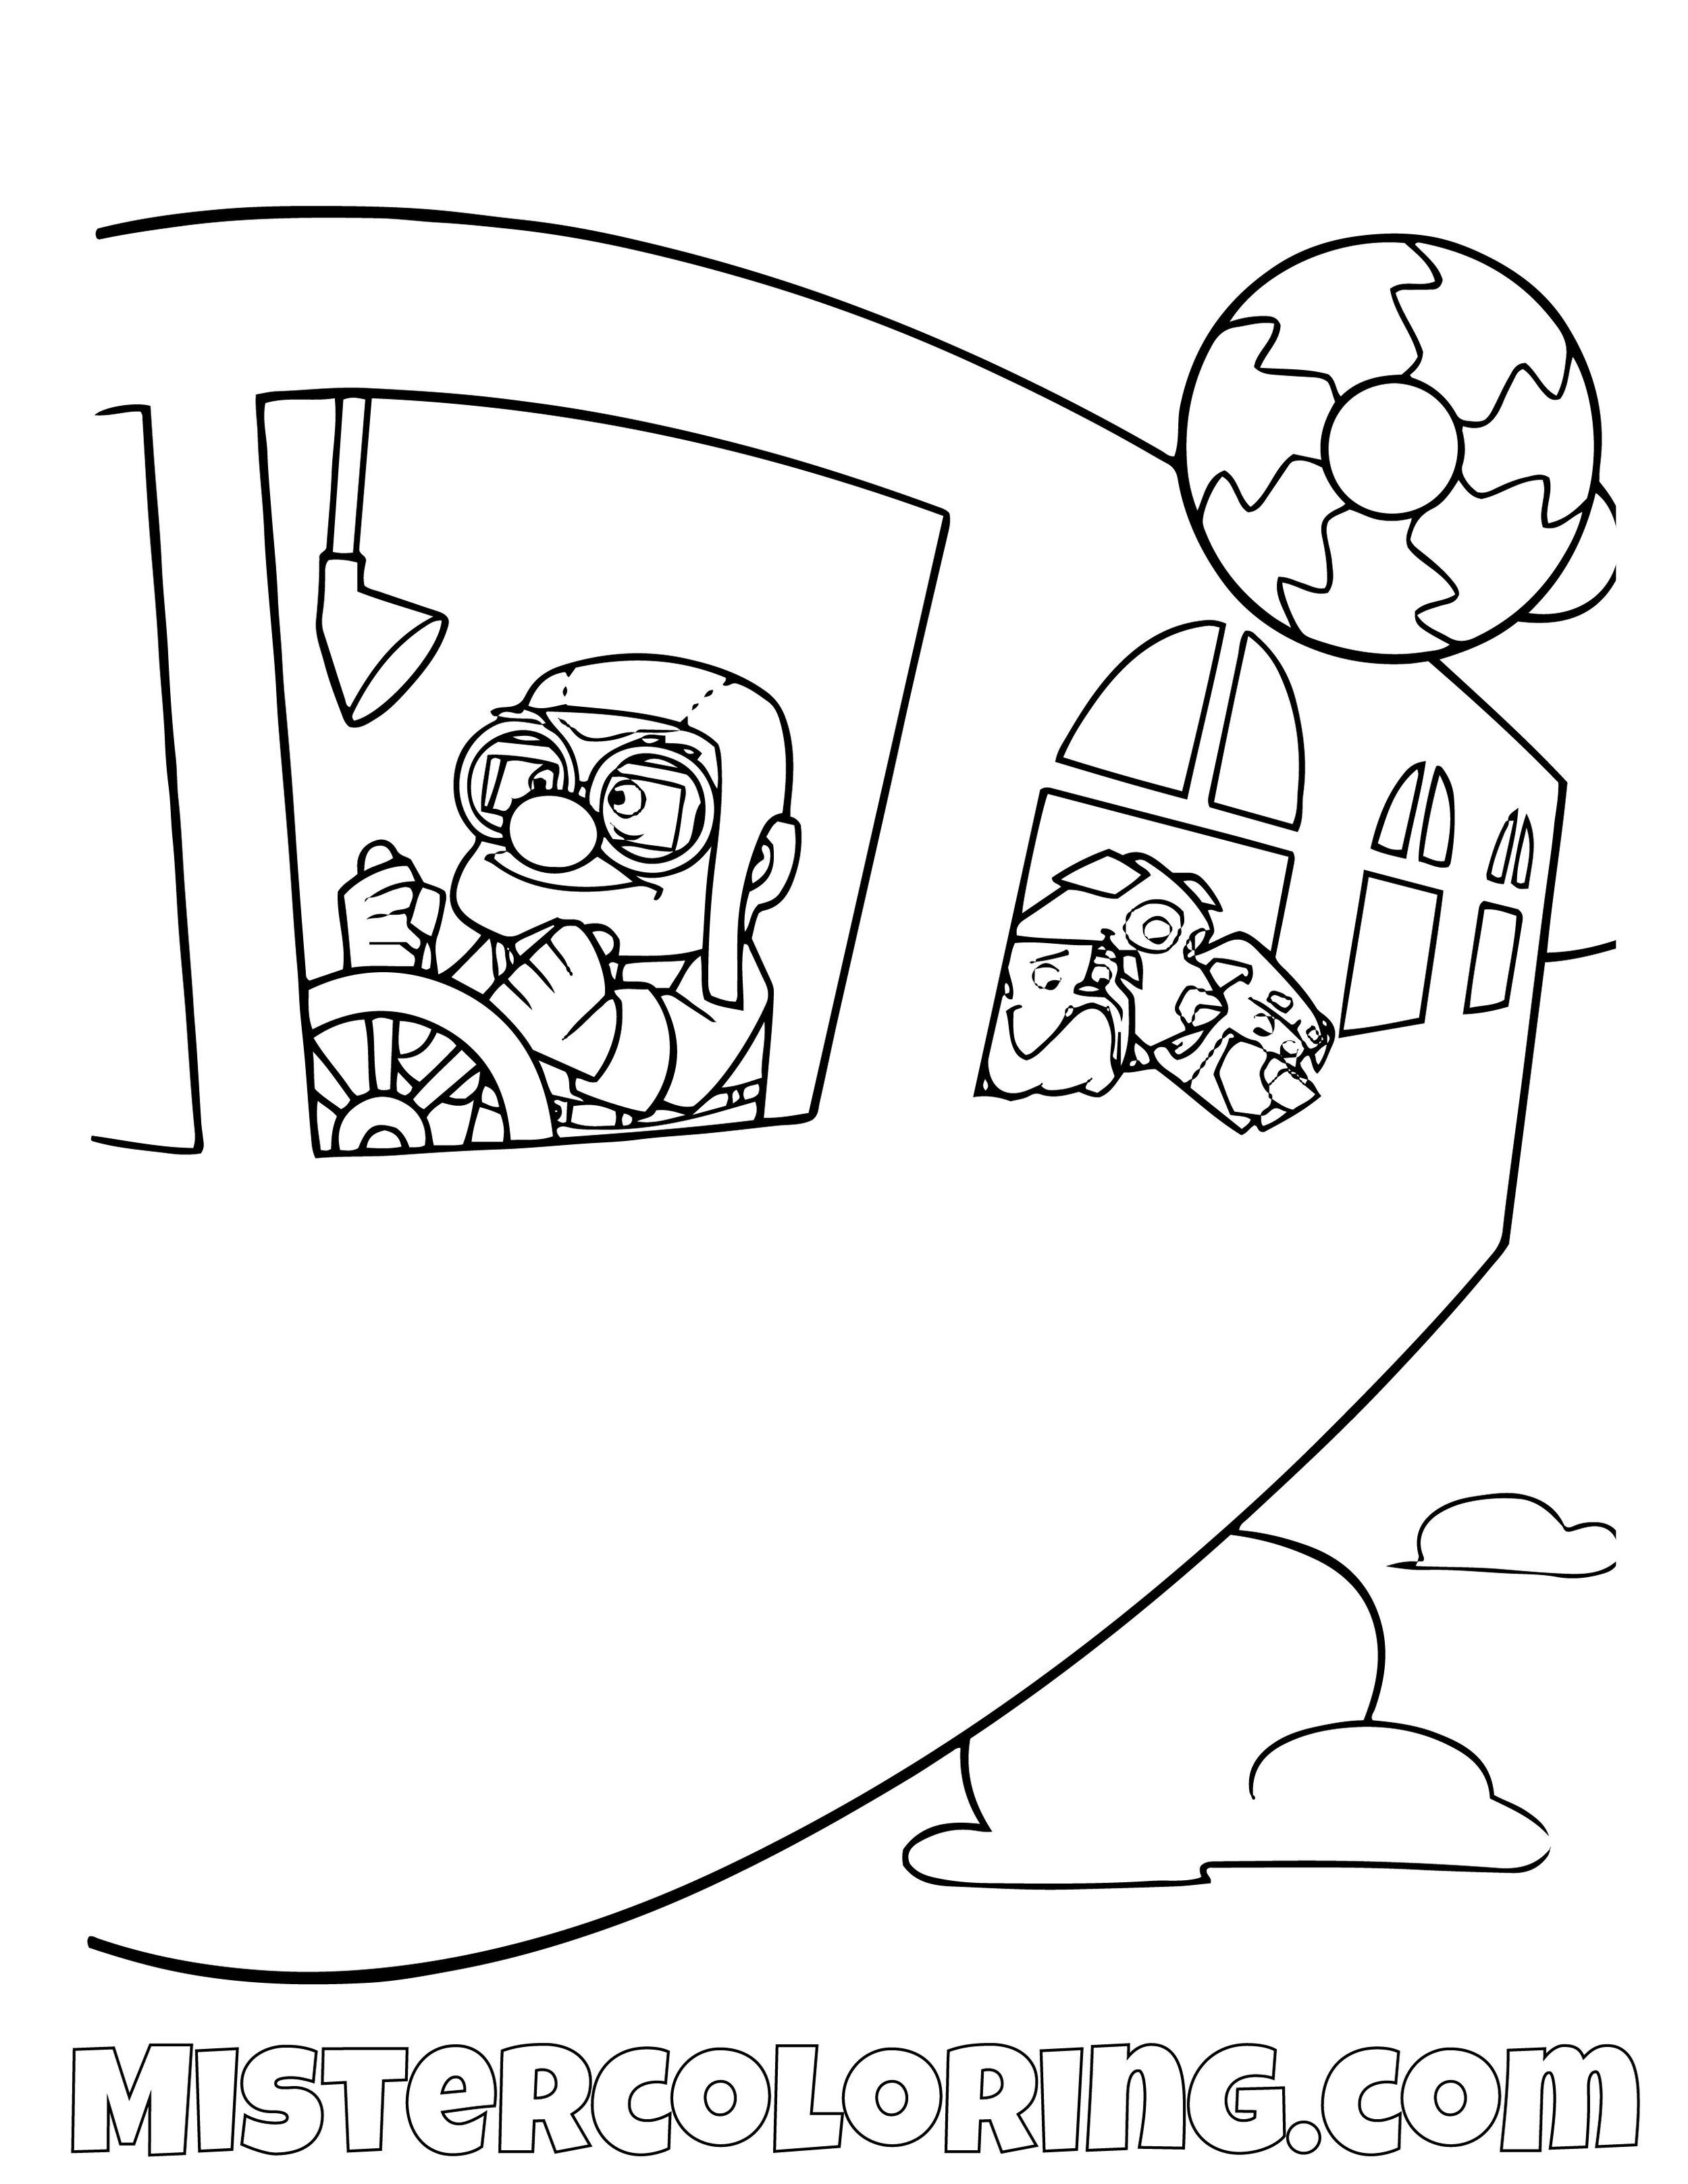 Carl Fredricksen Flying Spirit Adventure Disney Pixar Up Movie Coloring Pages For Kids